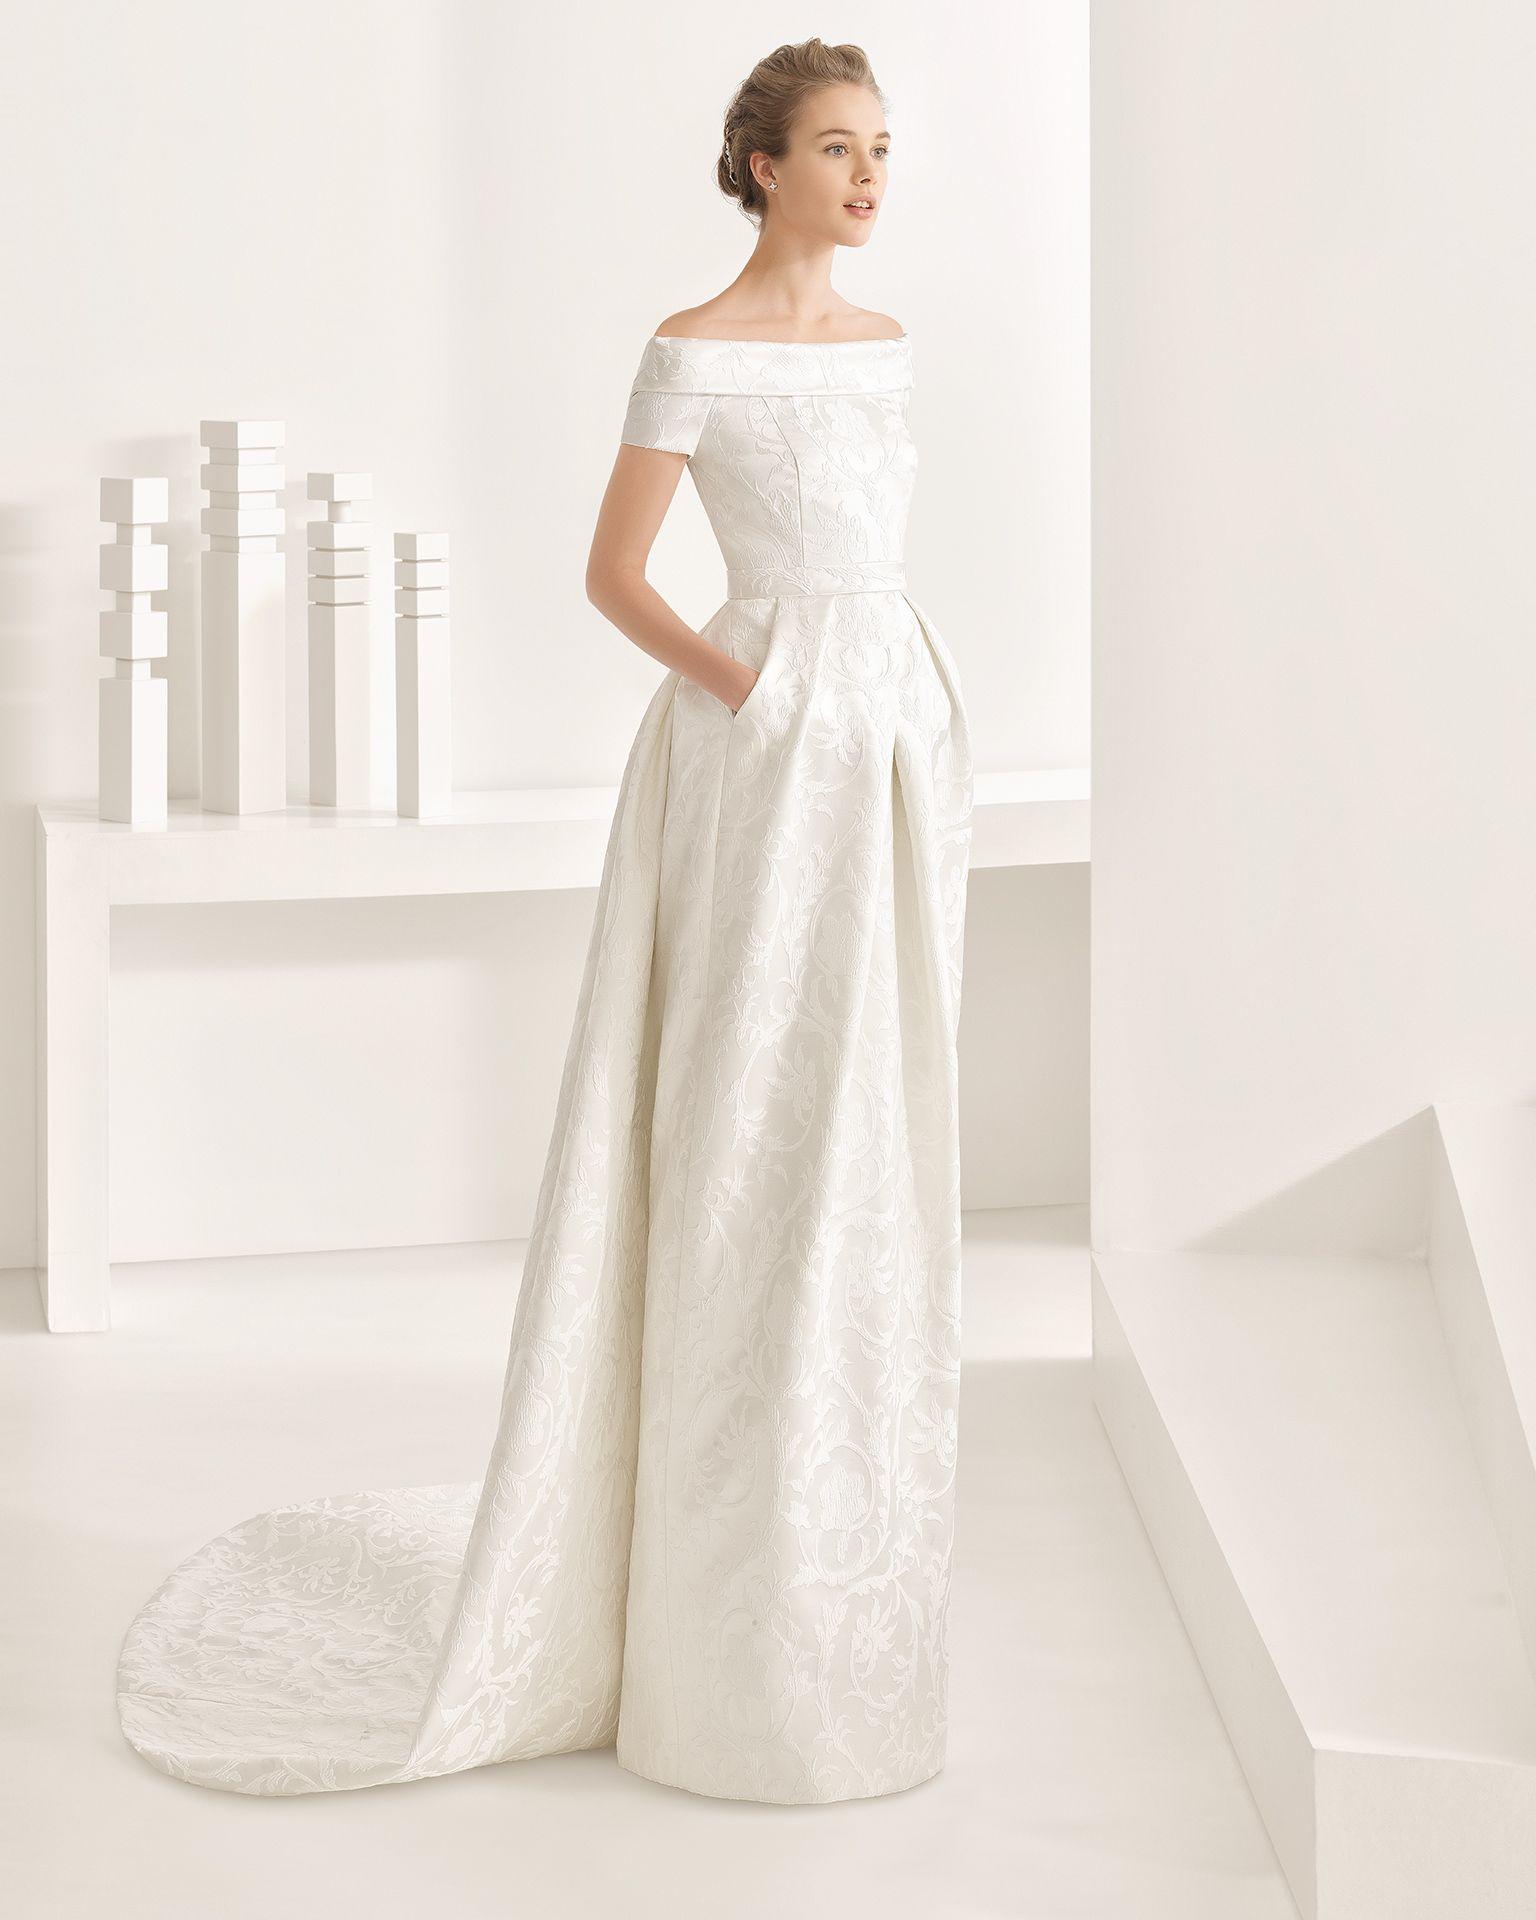 Nambia - 2017 Bridal Collection. Rosa Clará. | Pinterest | Wedding ...